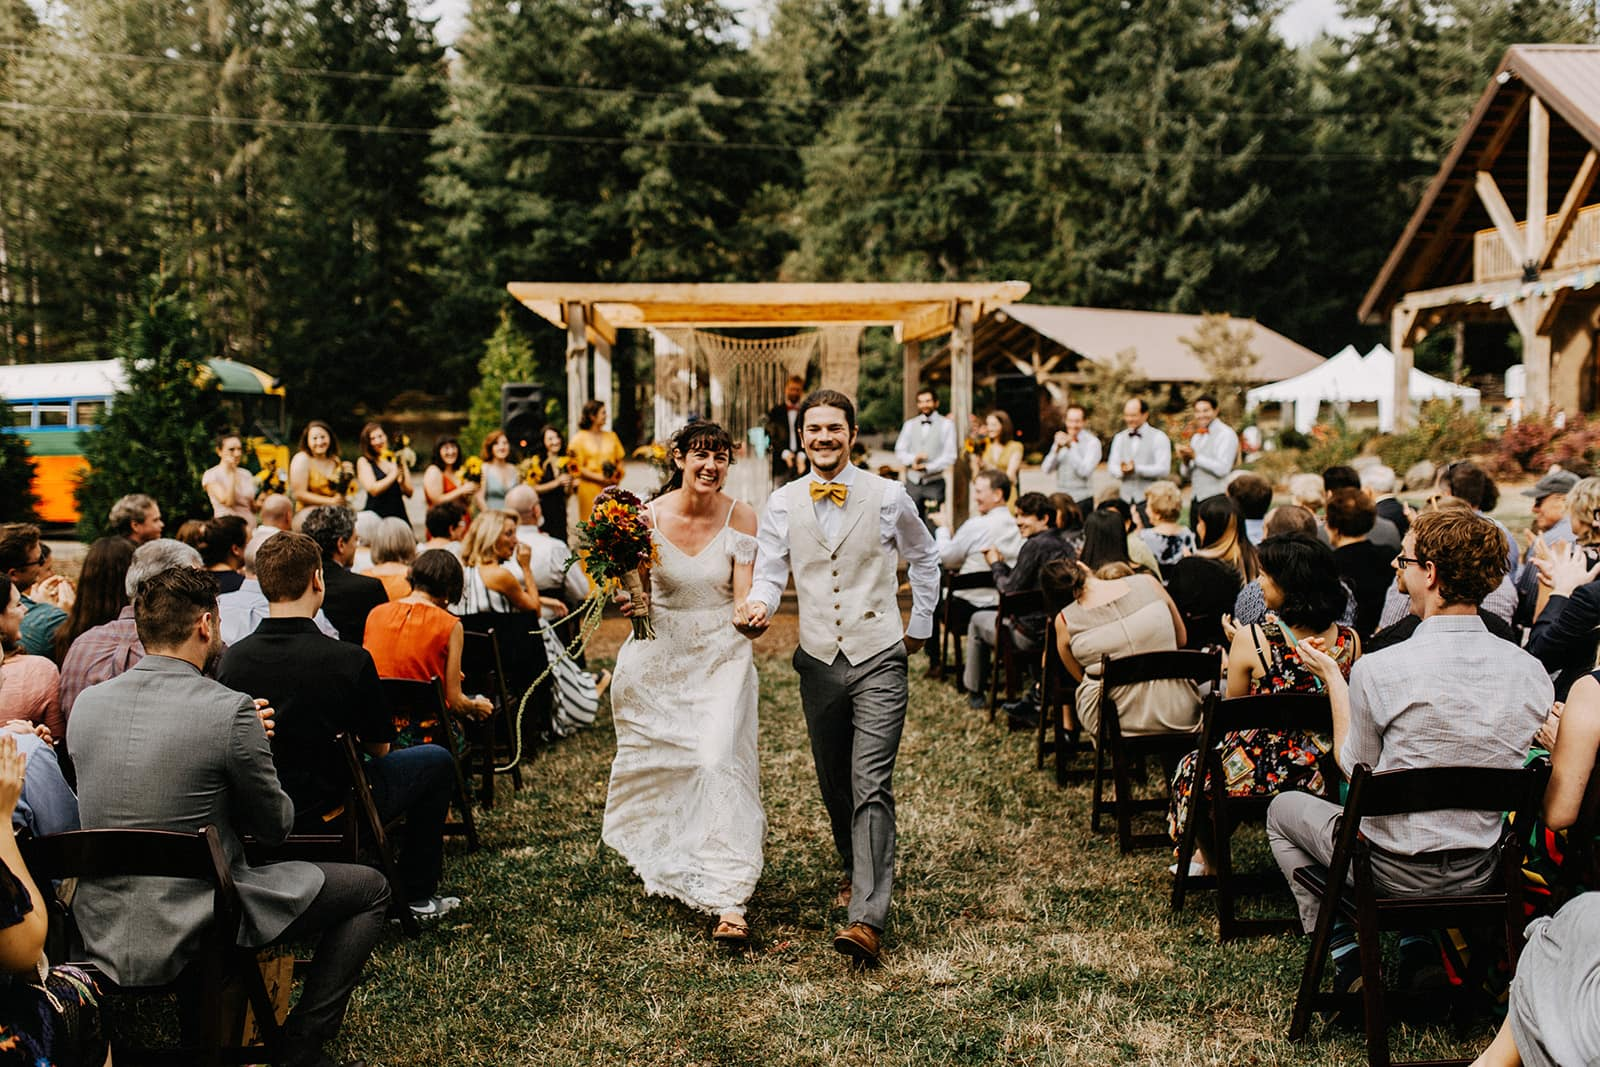 Wedding Venues In Oregon.30 Best Wedding Venues In Portland Oregon